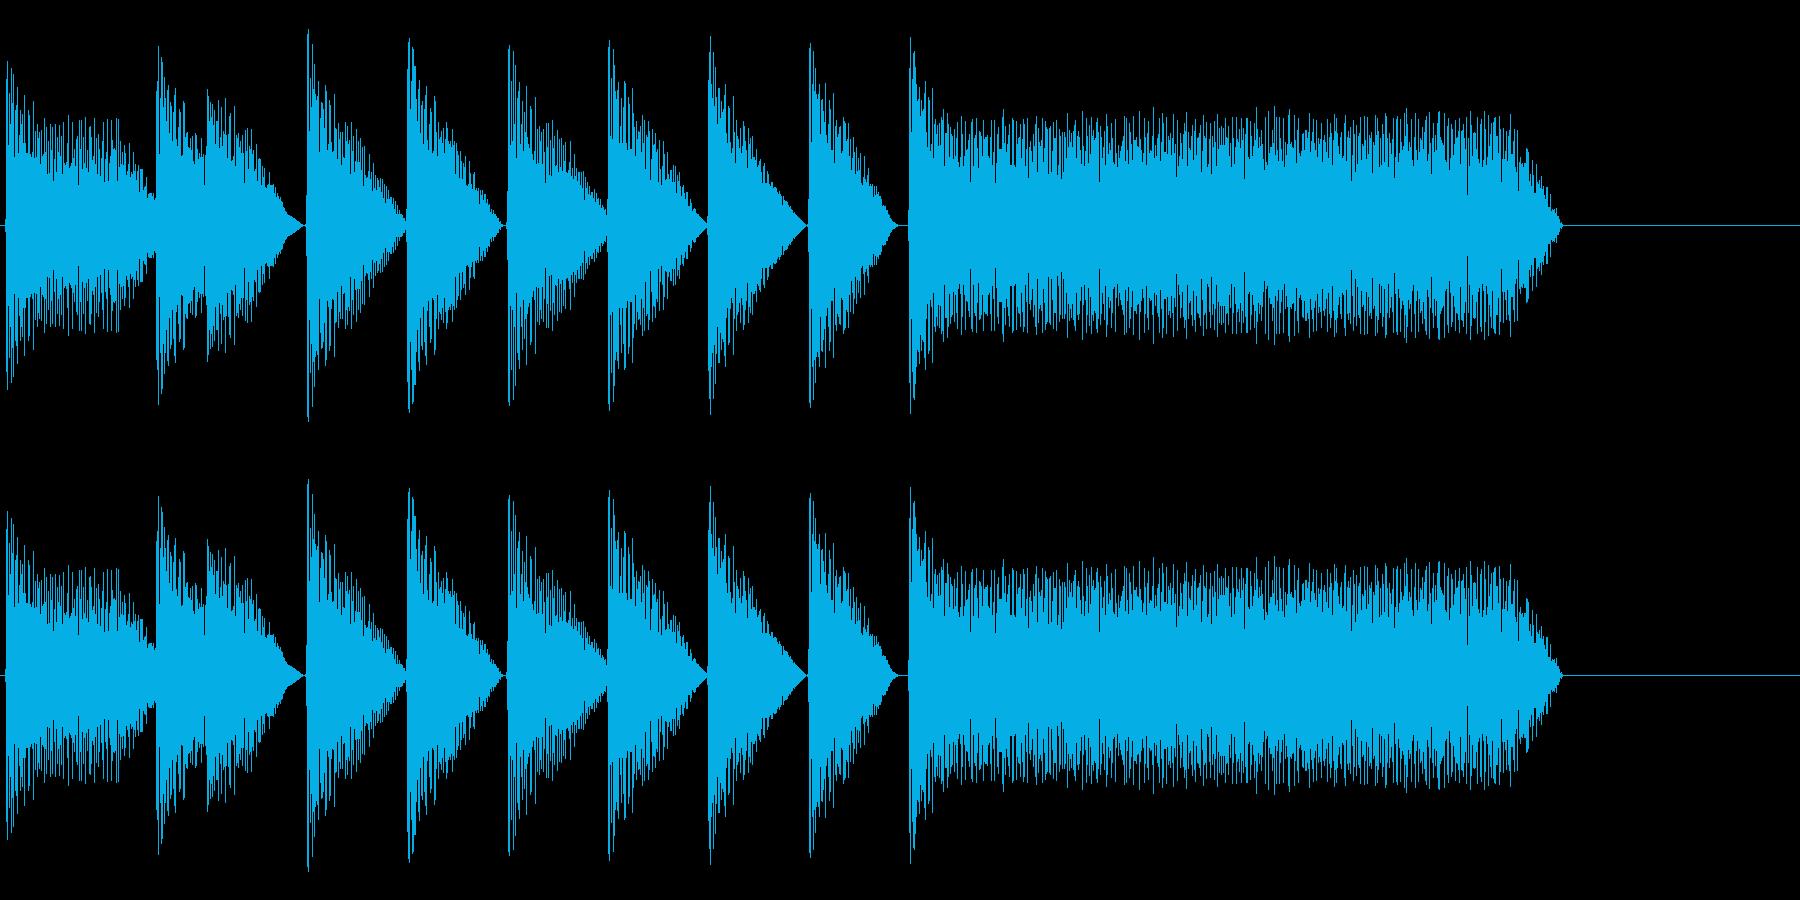 8bitジングル#8スタート&クリアの再生済みの波形